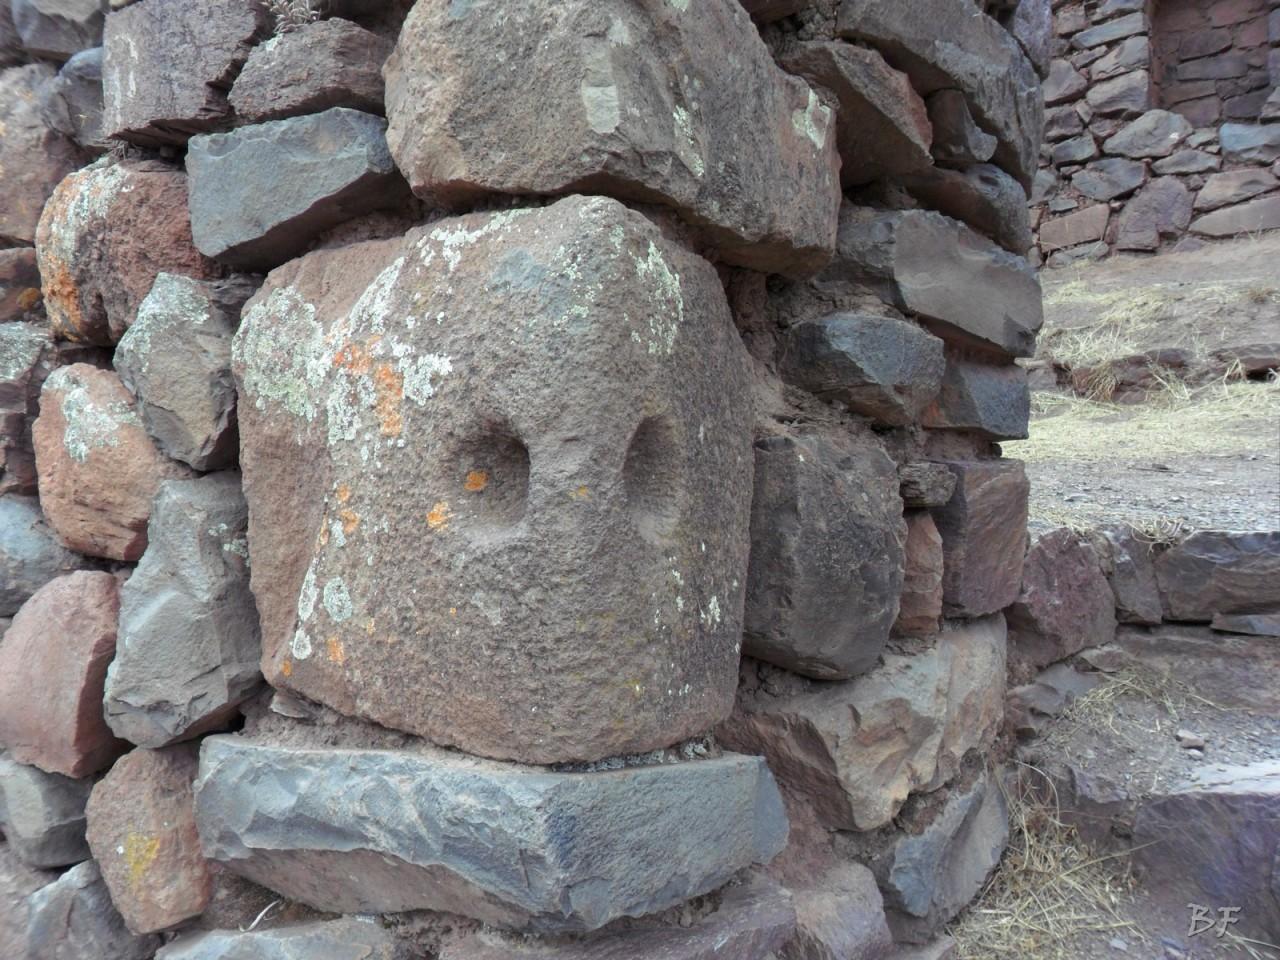 Mura-Poligonali-Megaliti-Altari-Rupestri-Pisac-Cusco-Perù-19